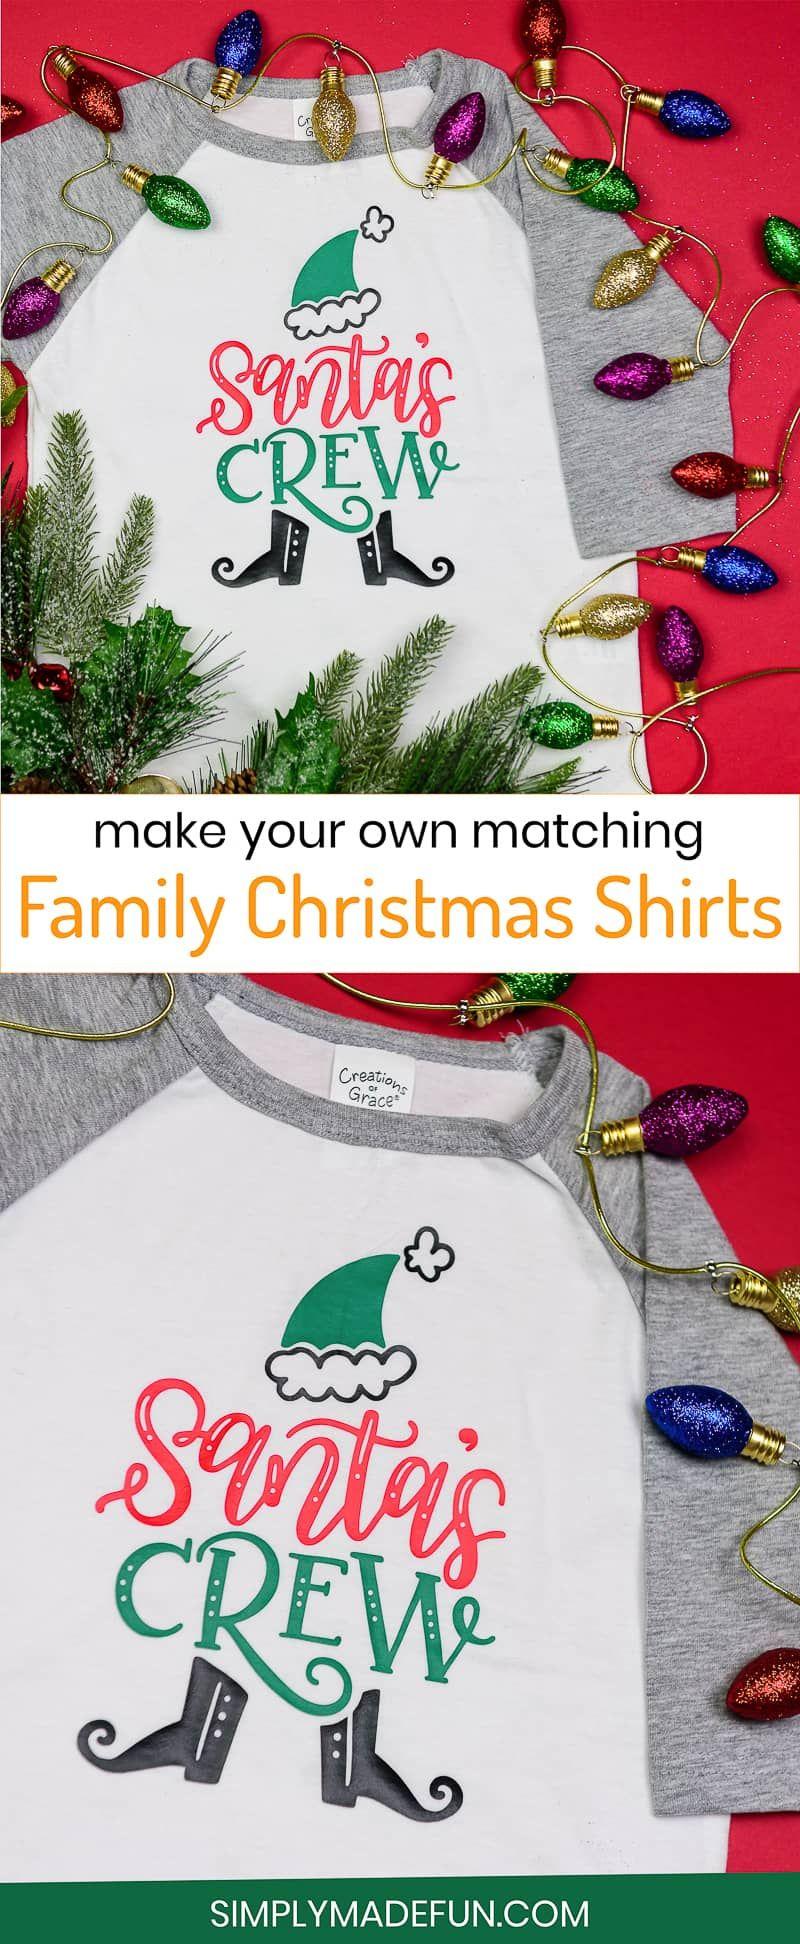 Diy Matching Family Christmas Shirts From Diy Christmas Shirts